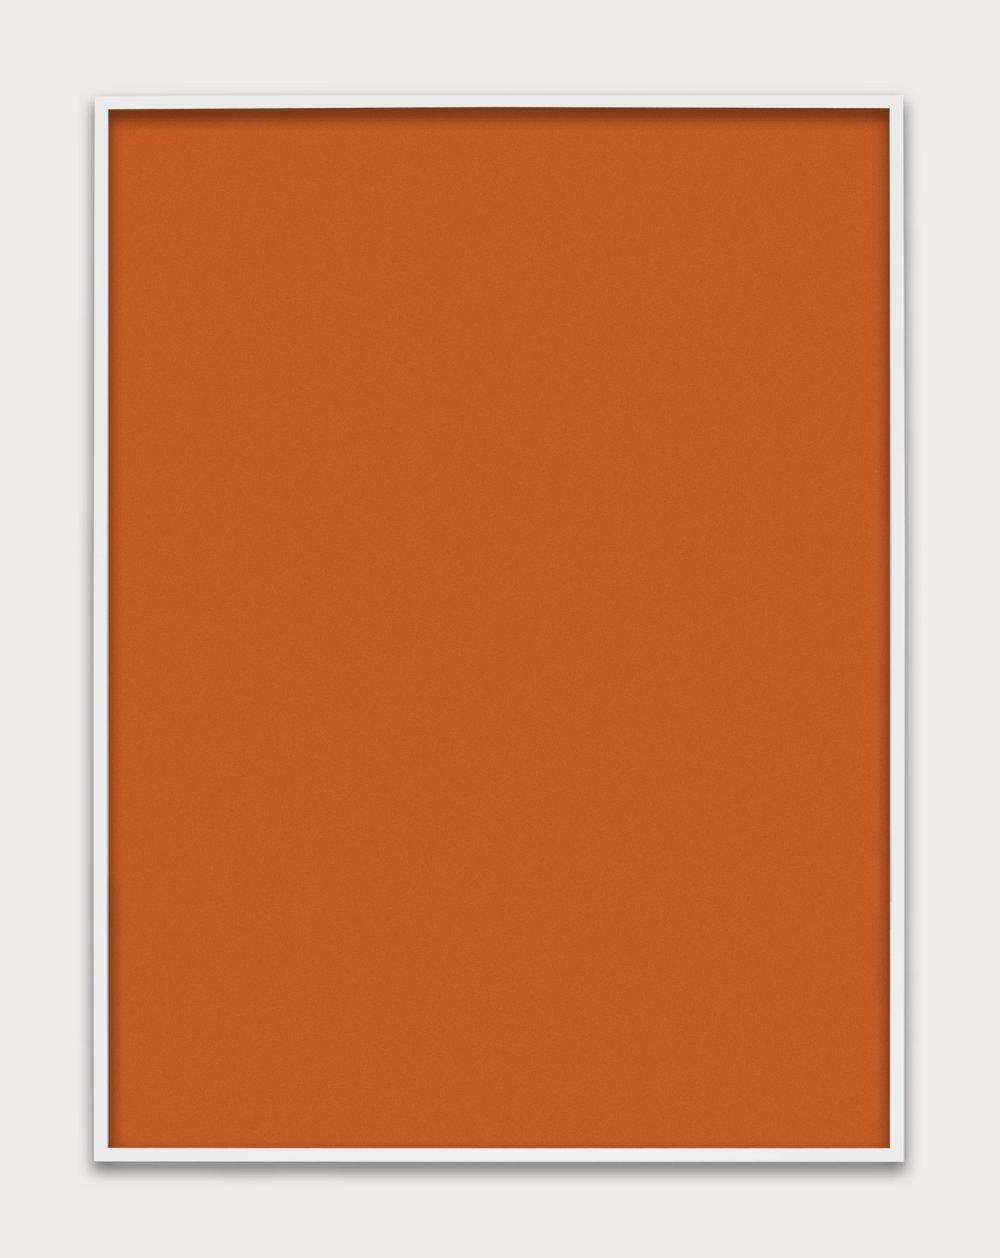 Untitled (Orange Monochrome), 2014 unique chromogenic print 152,4 x 122 cm - 60 x 48 inches